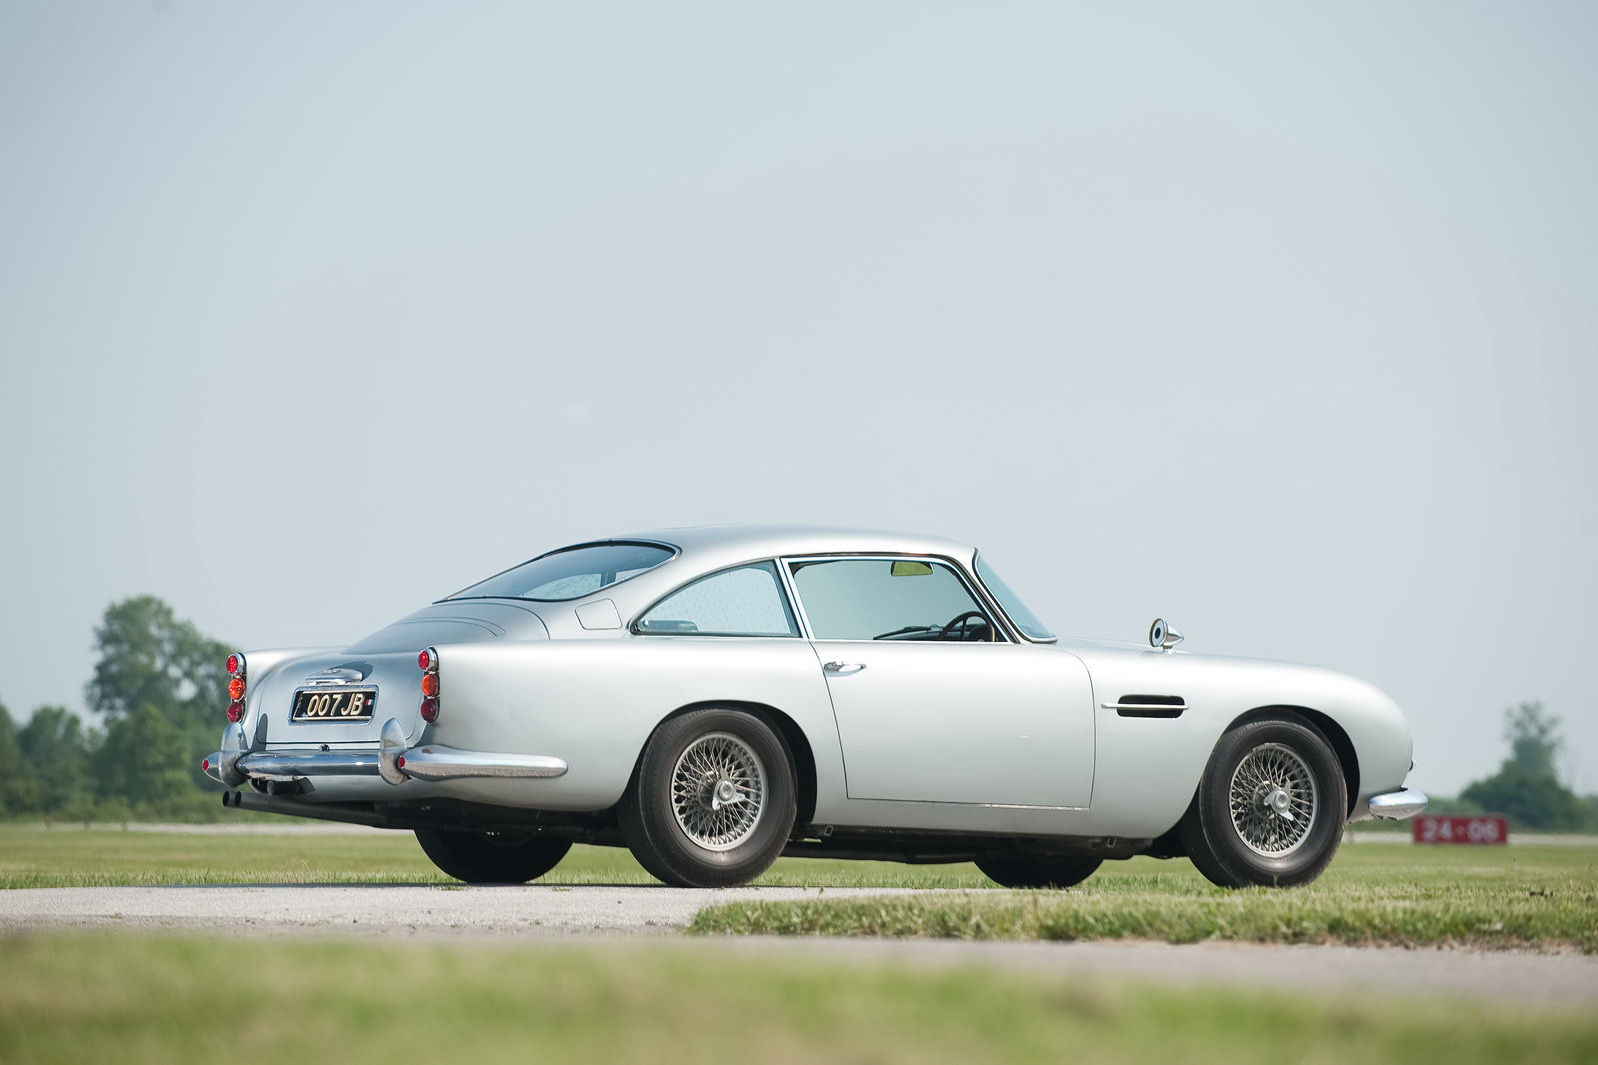 james bond 1964 aston martin db5 101 james bonds original 007 aston. Cars Review. Best American Auto & Cars Review